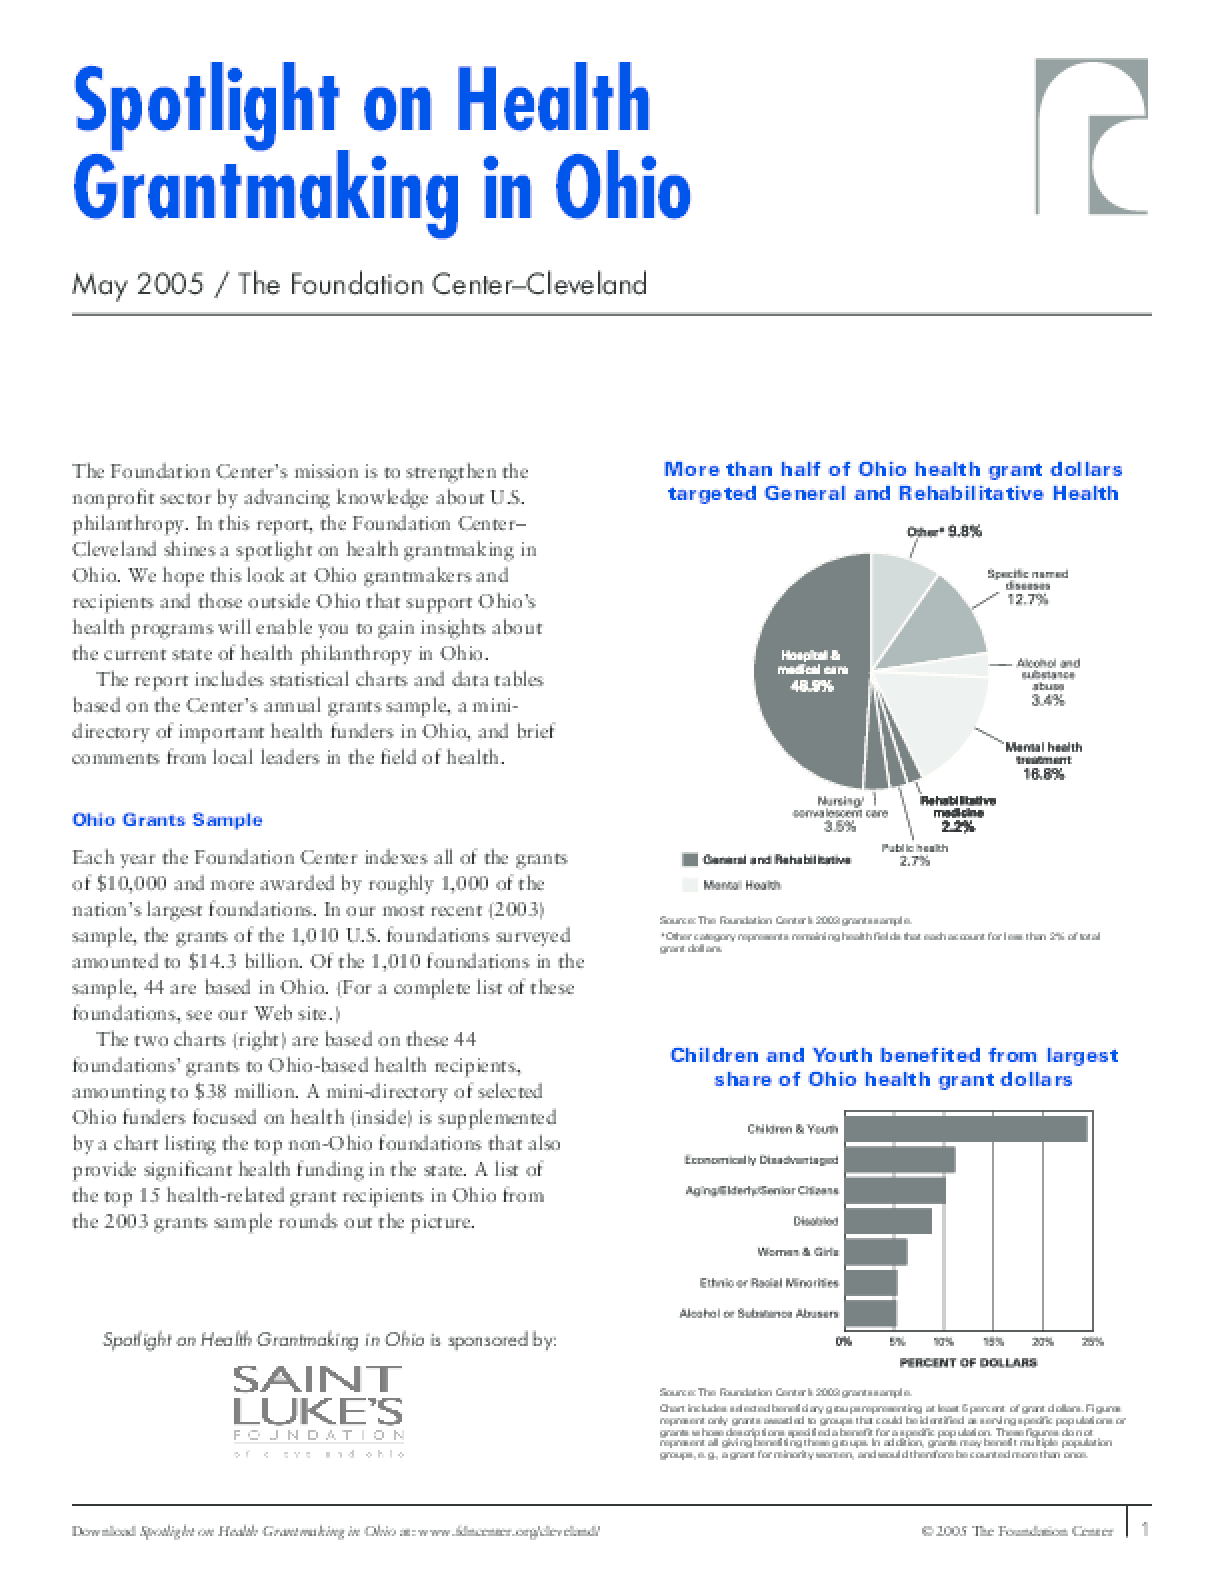 Spotlight on Health Grantmaking in Ohio